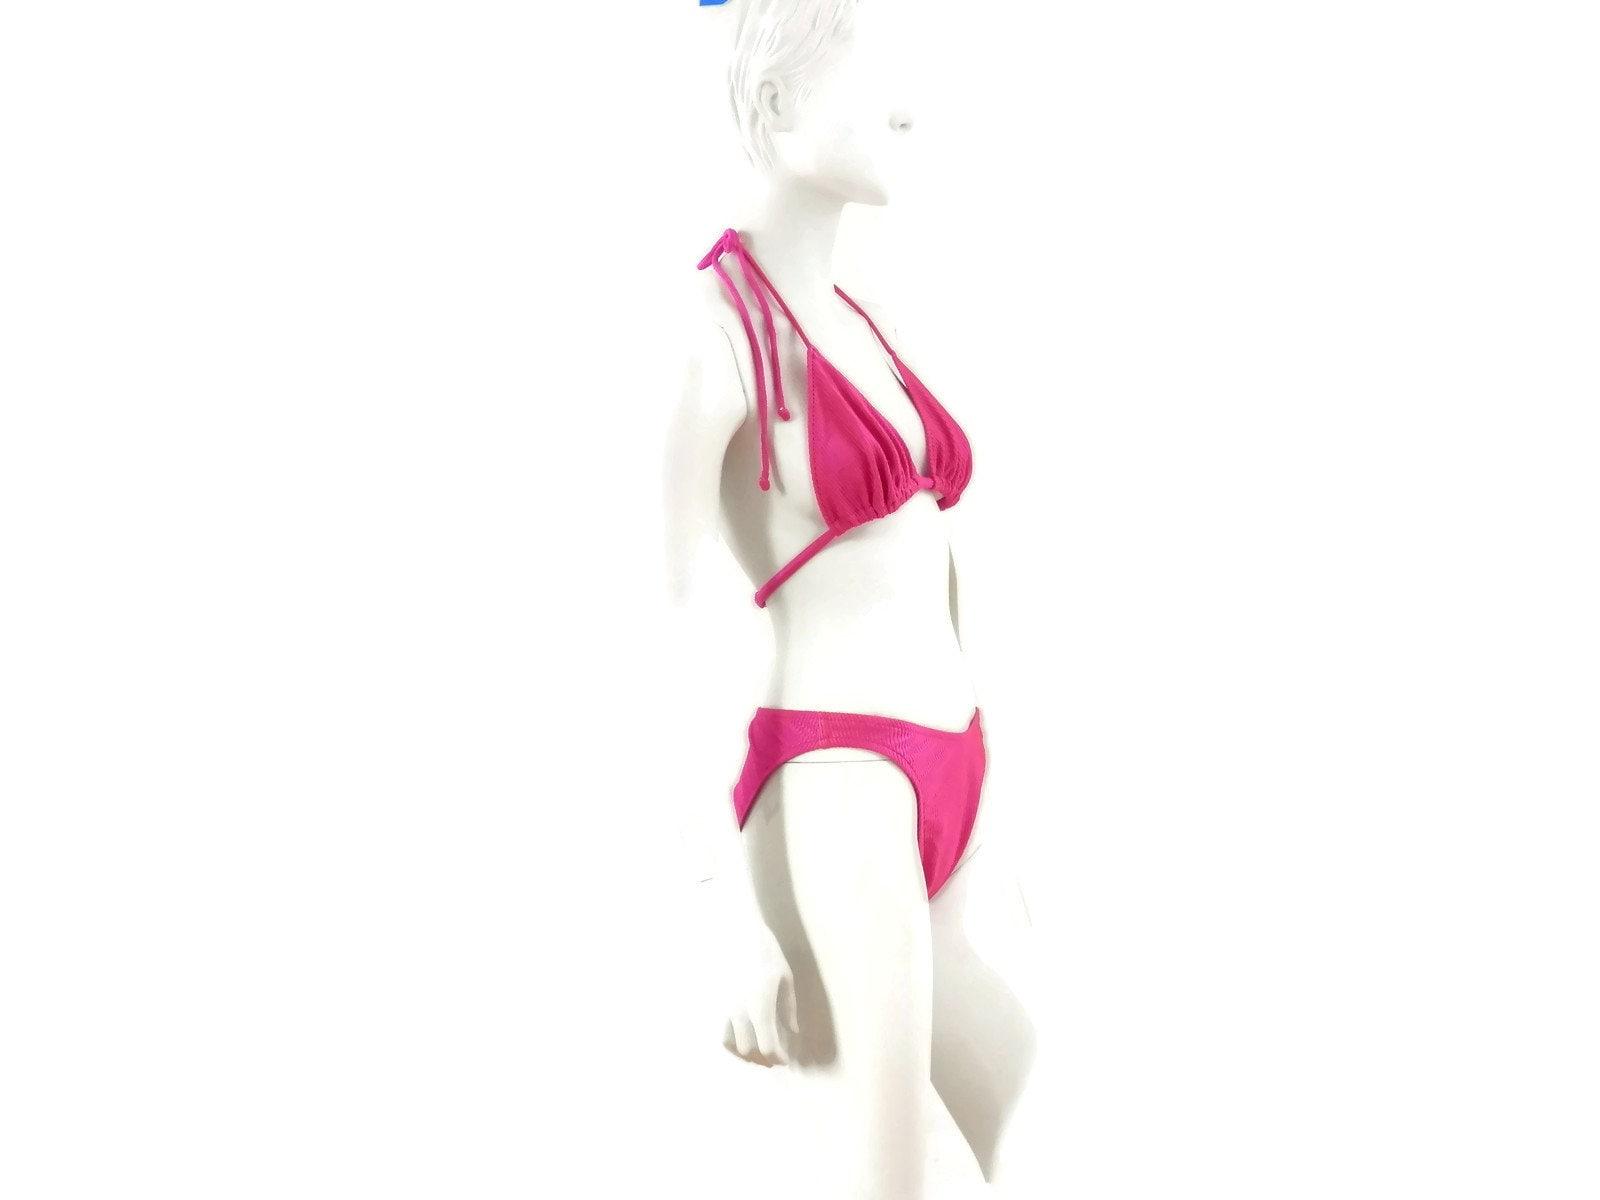 f4178909d8a Jantzen Hot Pink Bikini Two Piece Bathing Suit Vintage | Etsy